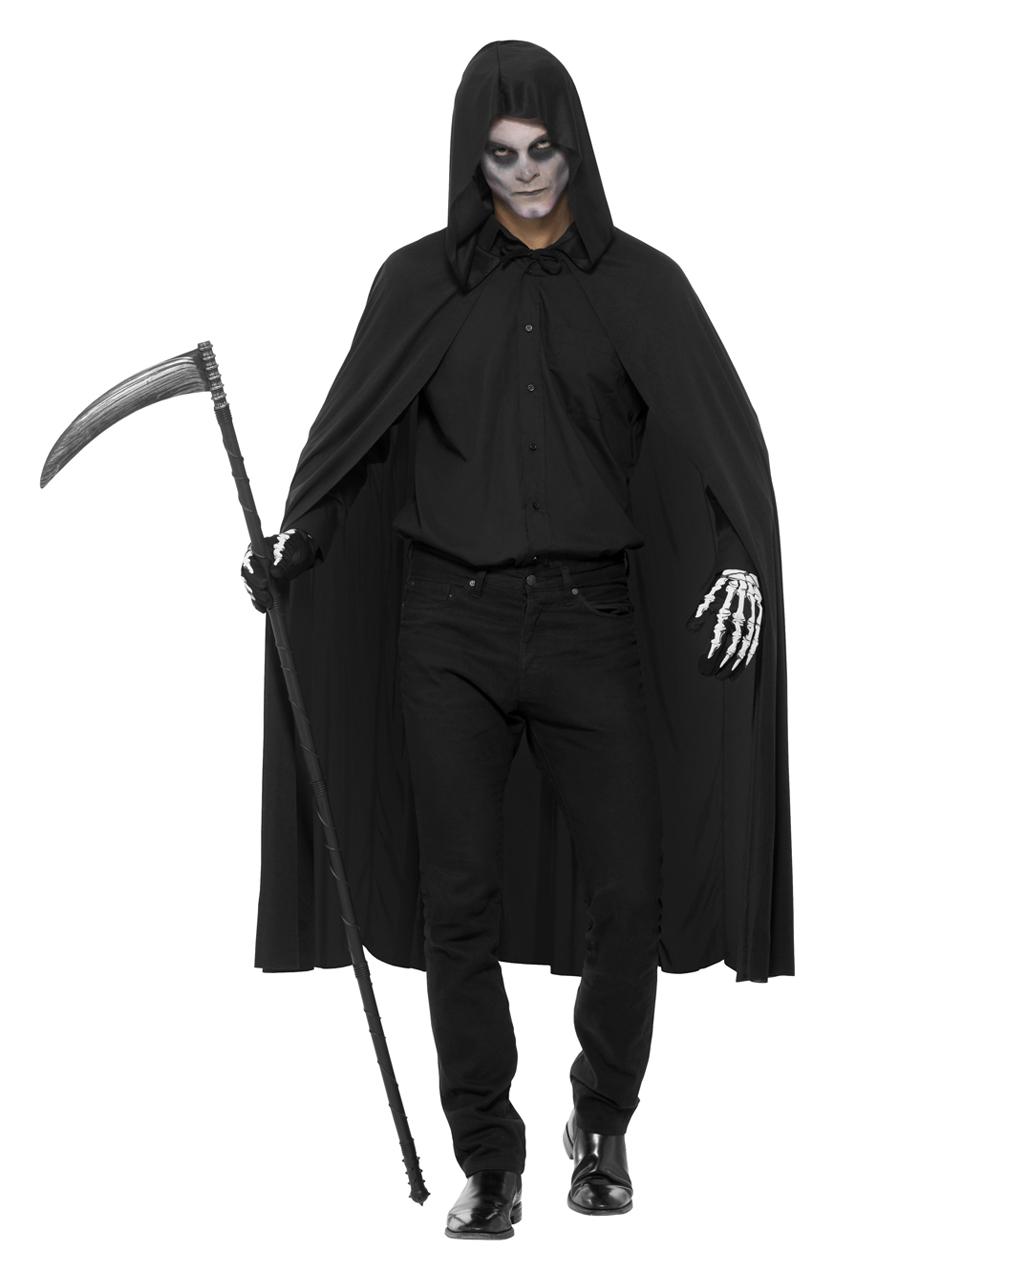 Grim Reaper Sense Grim Reaper Sense Grim Reaper Sense  sc 1 st  Horror-Shop & Grim Reaper Sense   Halloween toy weapon   horror-shop.com